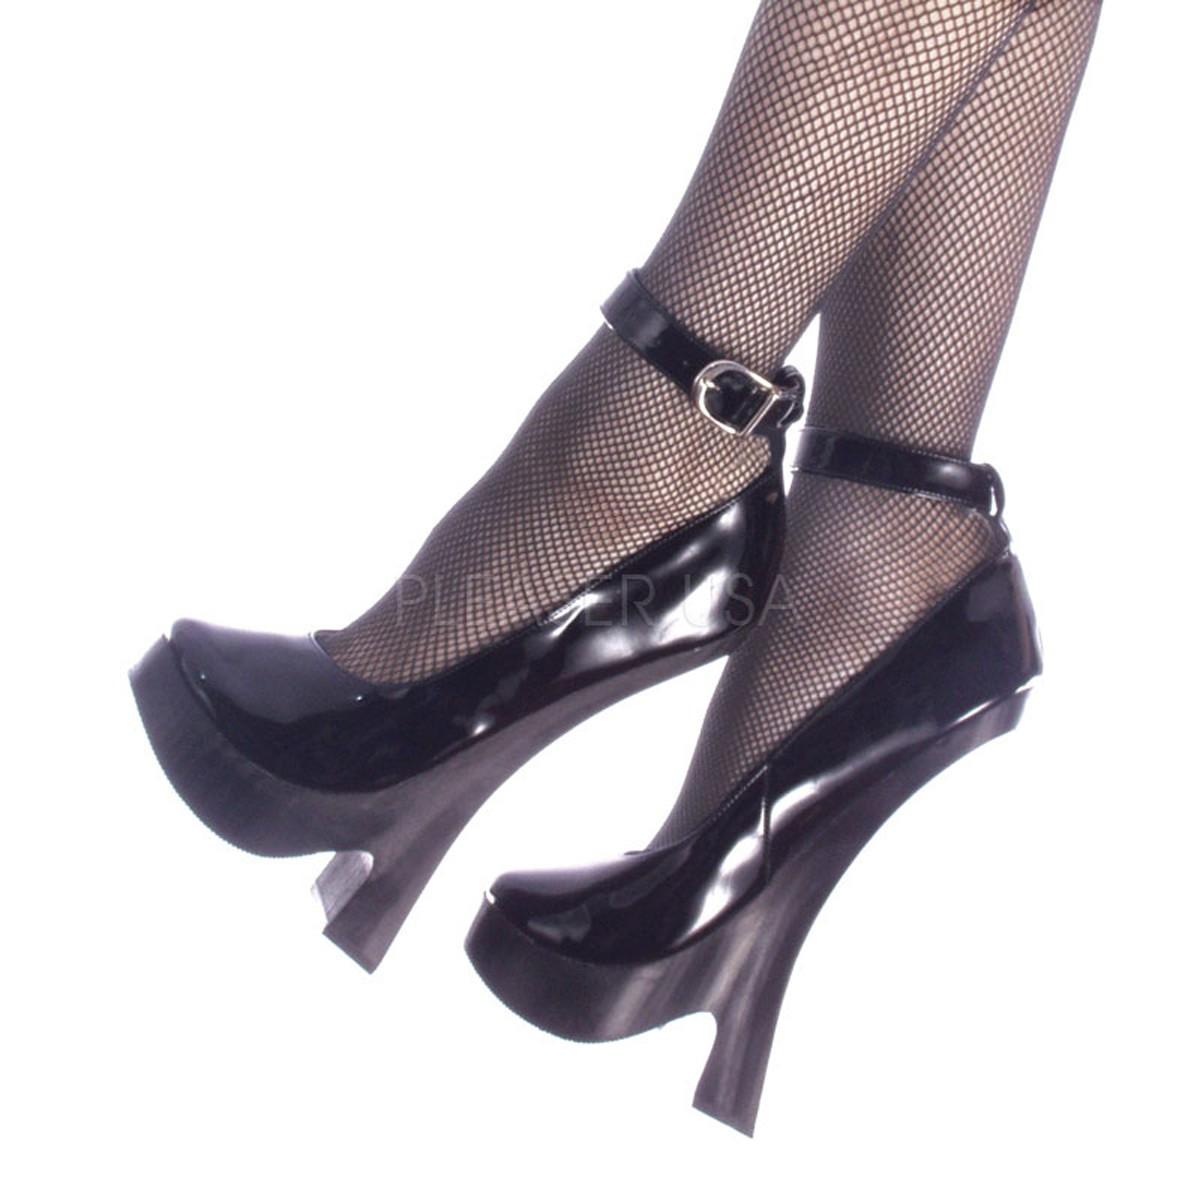 Devious Femme-12 - extreme Fetisch High Heels 35-45